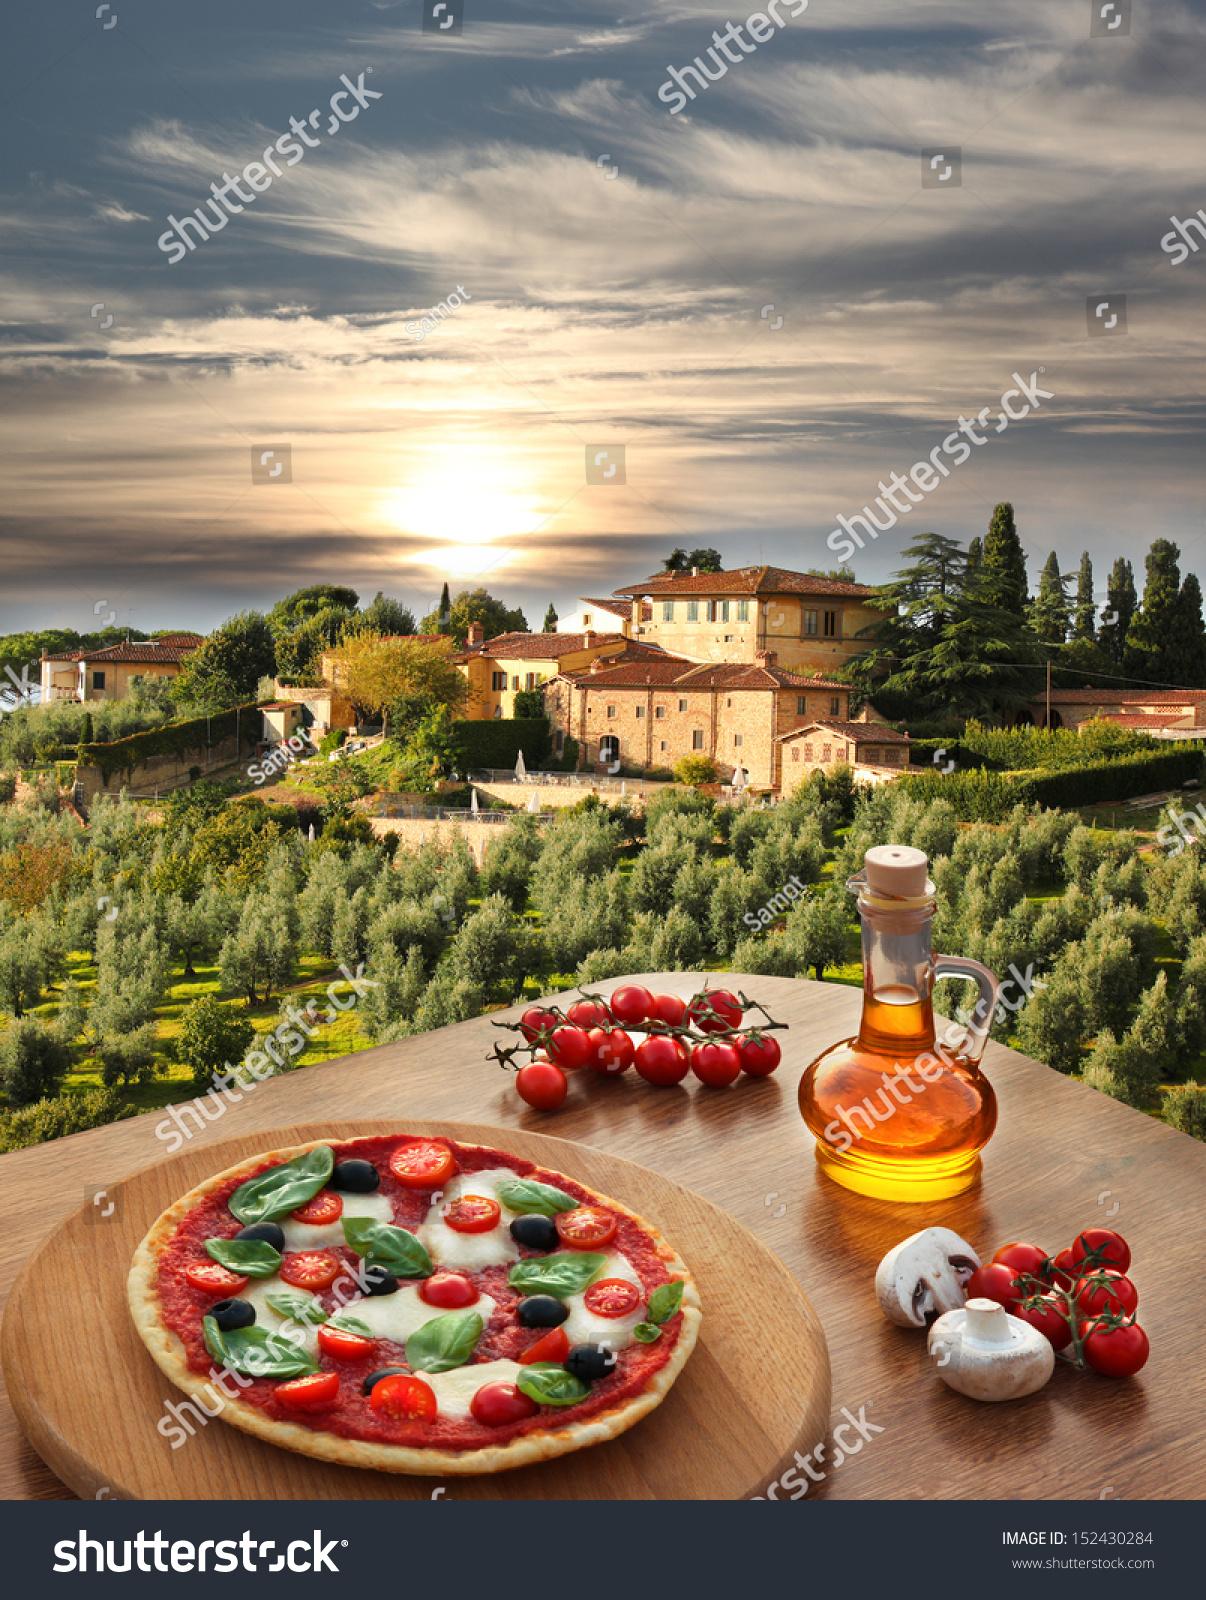 Italian Pizza Chianti Against Olive Trees Nature Parks